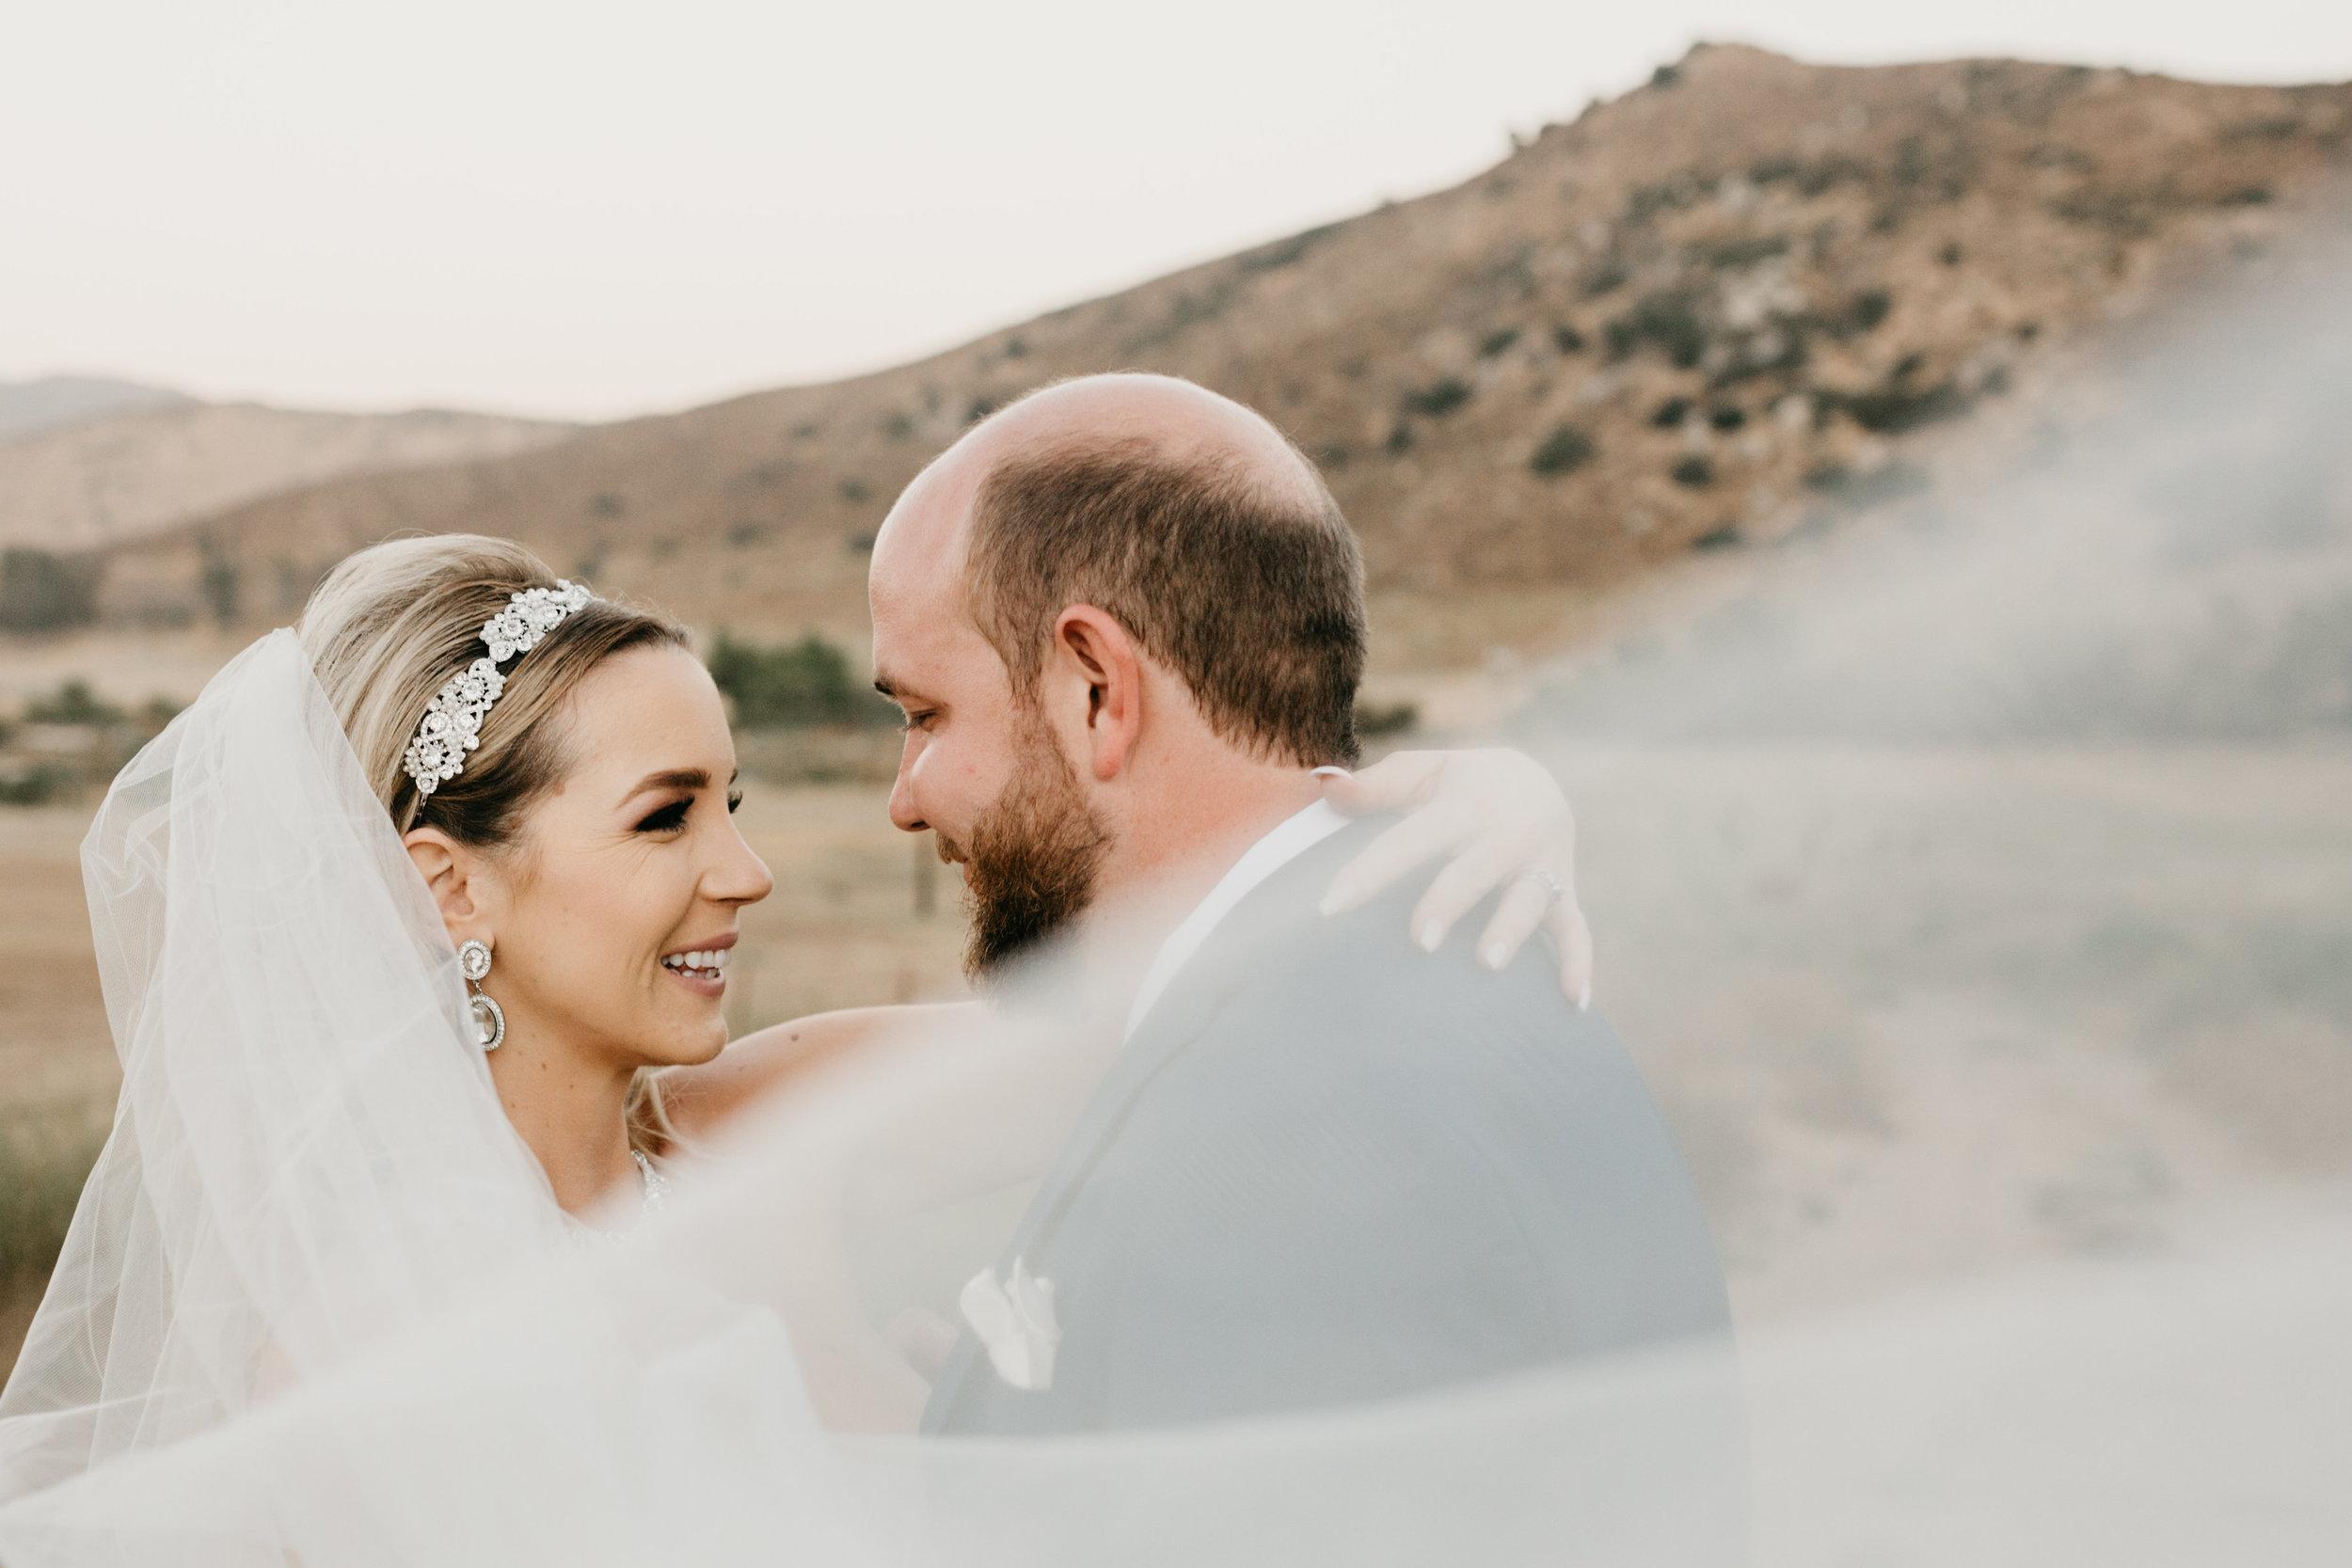 DianaLakePhoto-L+M-San-Diego-Wedding-Mr&Mrs103.jpg